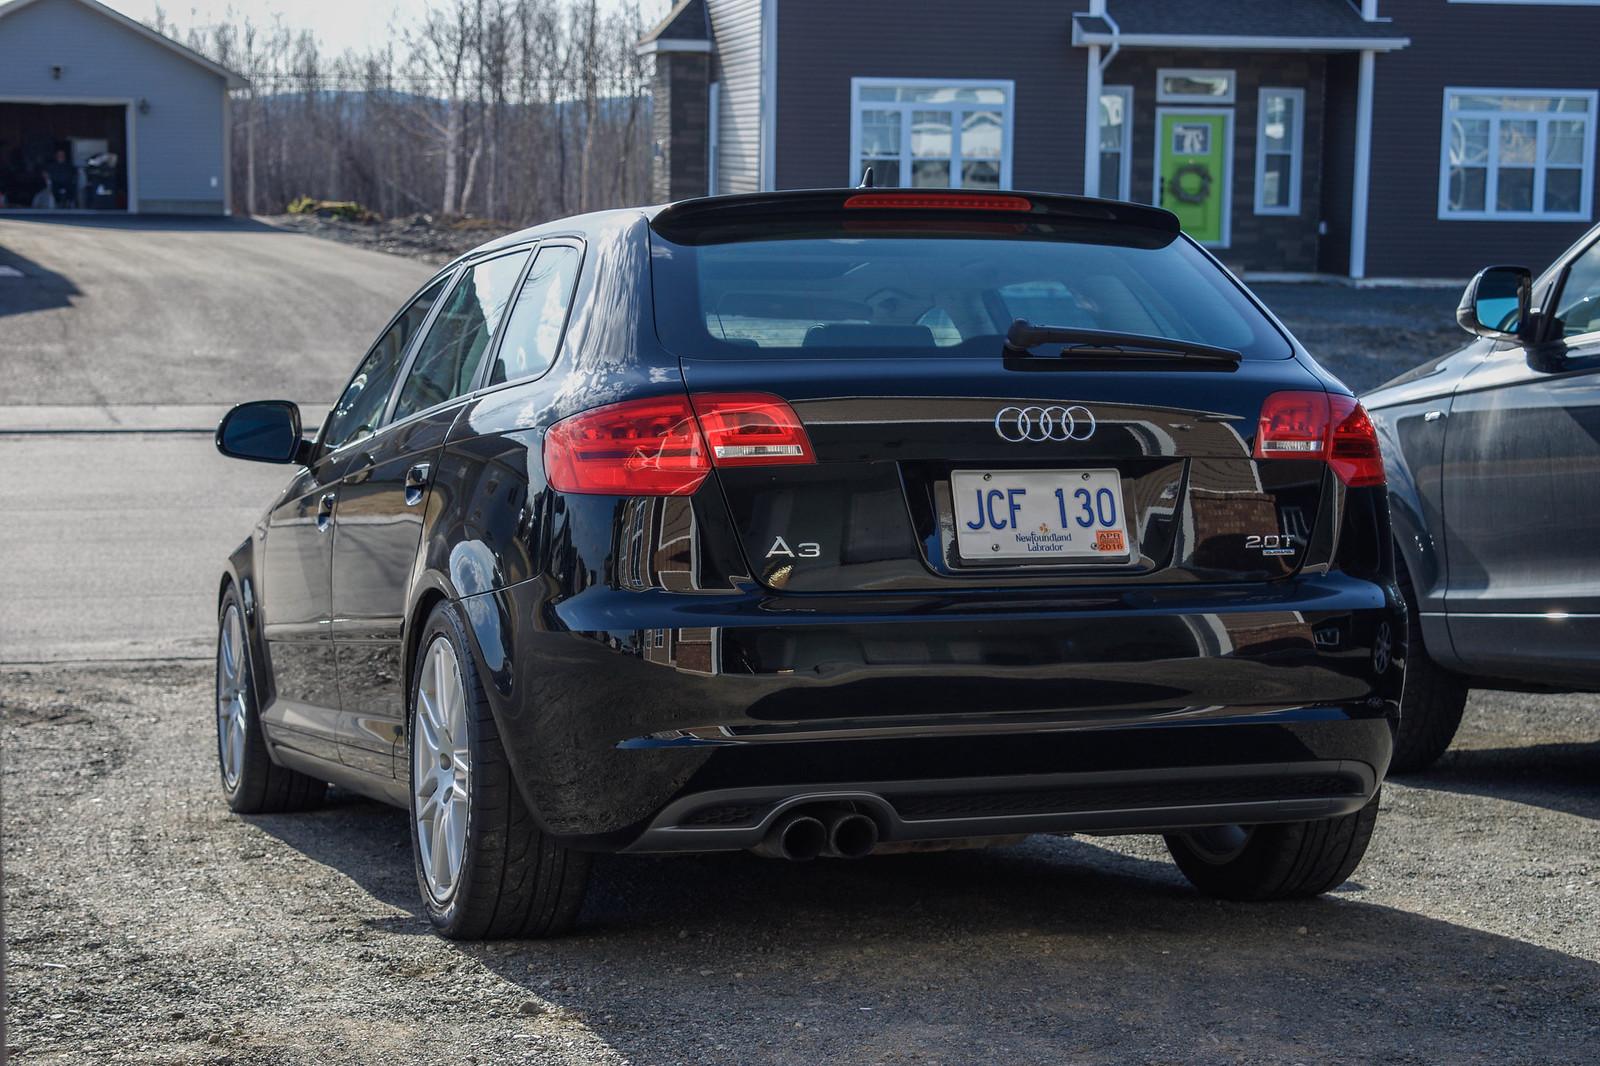 CustomObsessions com Forum • View topic - jmarch :2014 Audi Q7 S